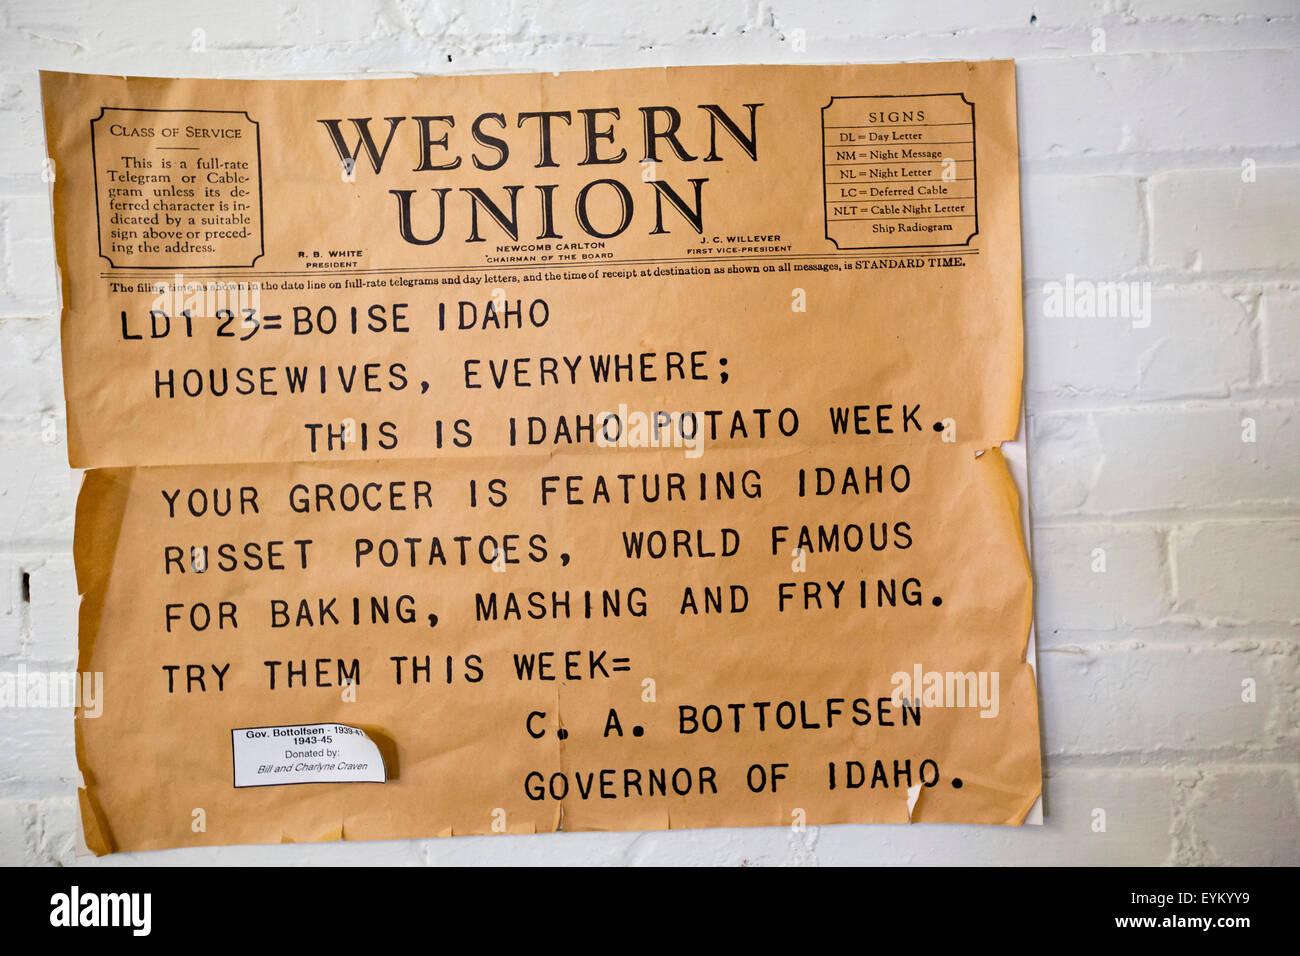 Idaho Potato Museum Stock Photos & Idaho Potato Museum Stock Images